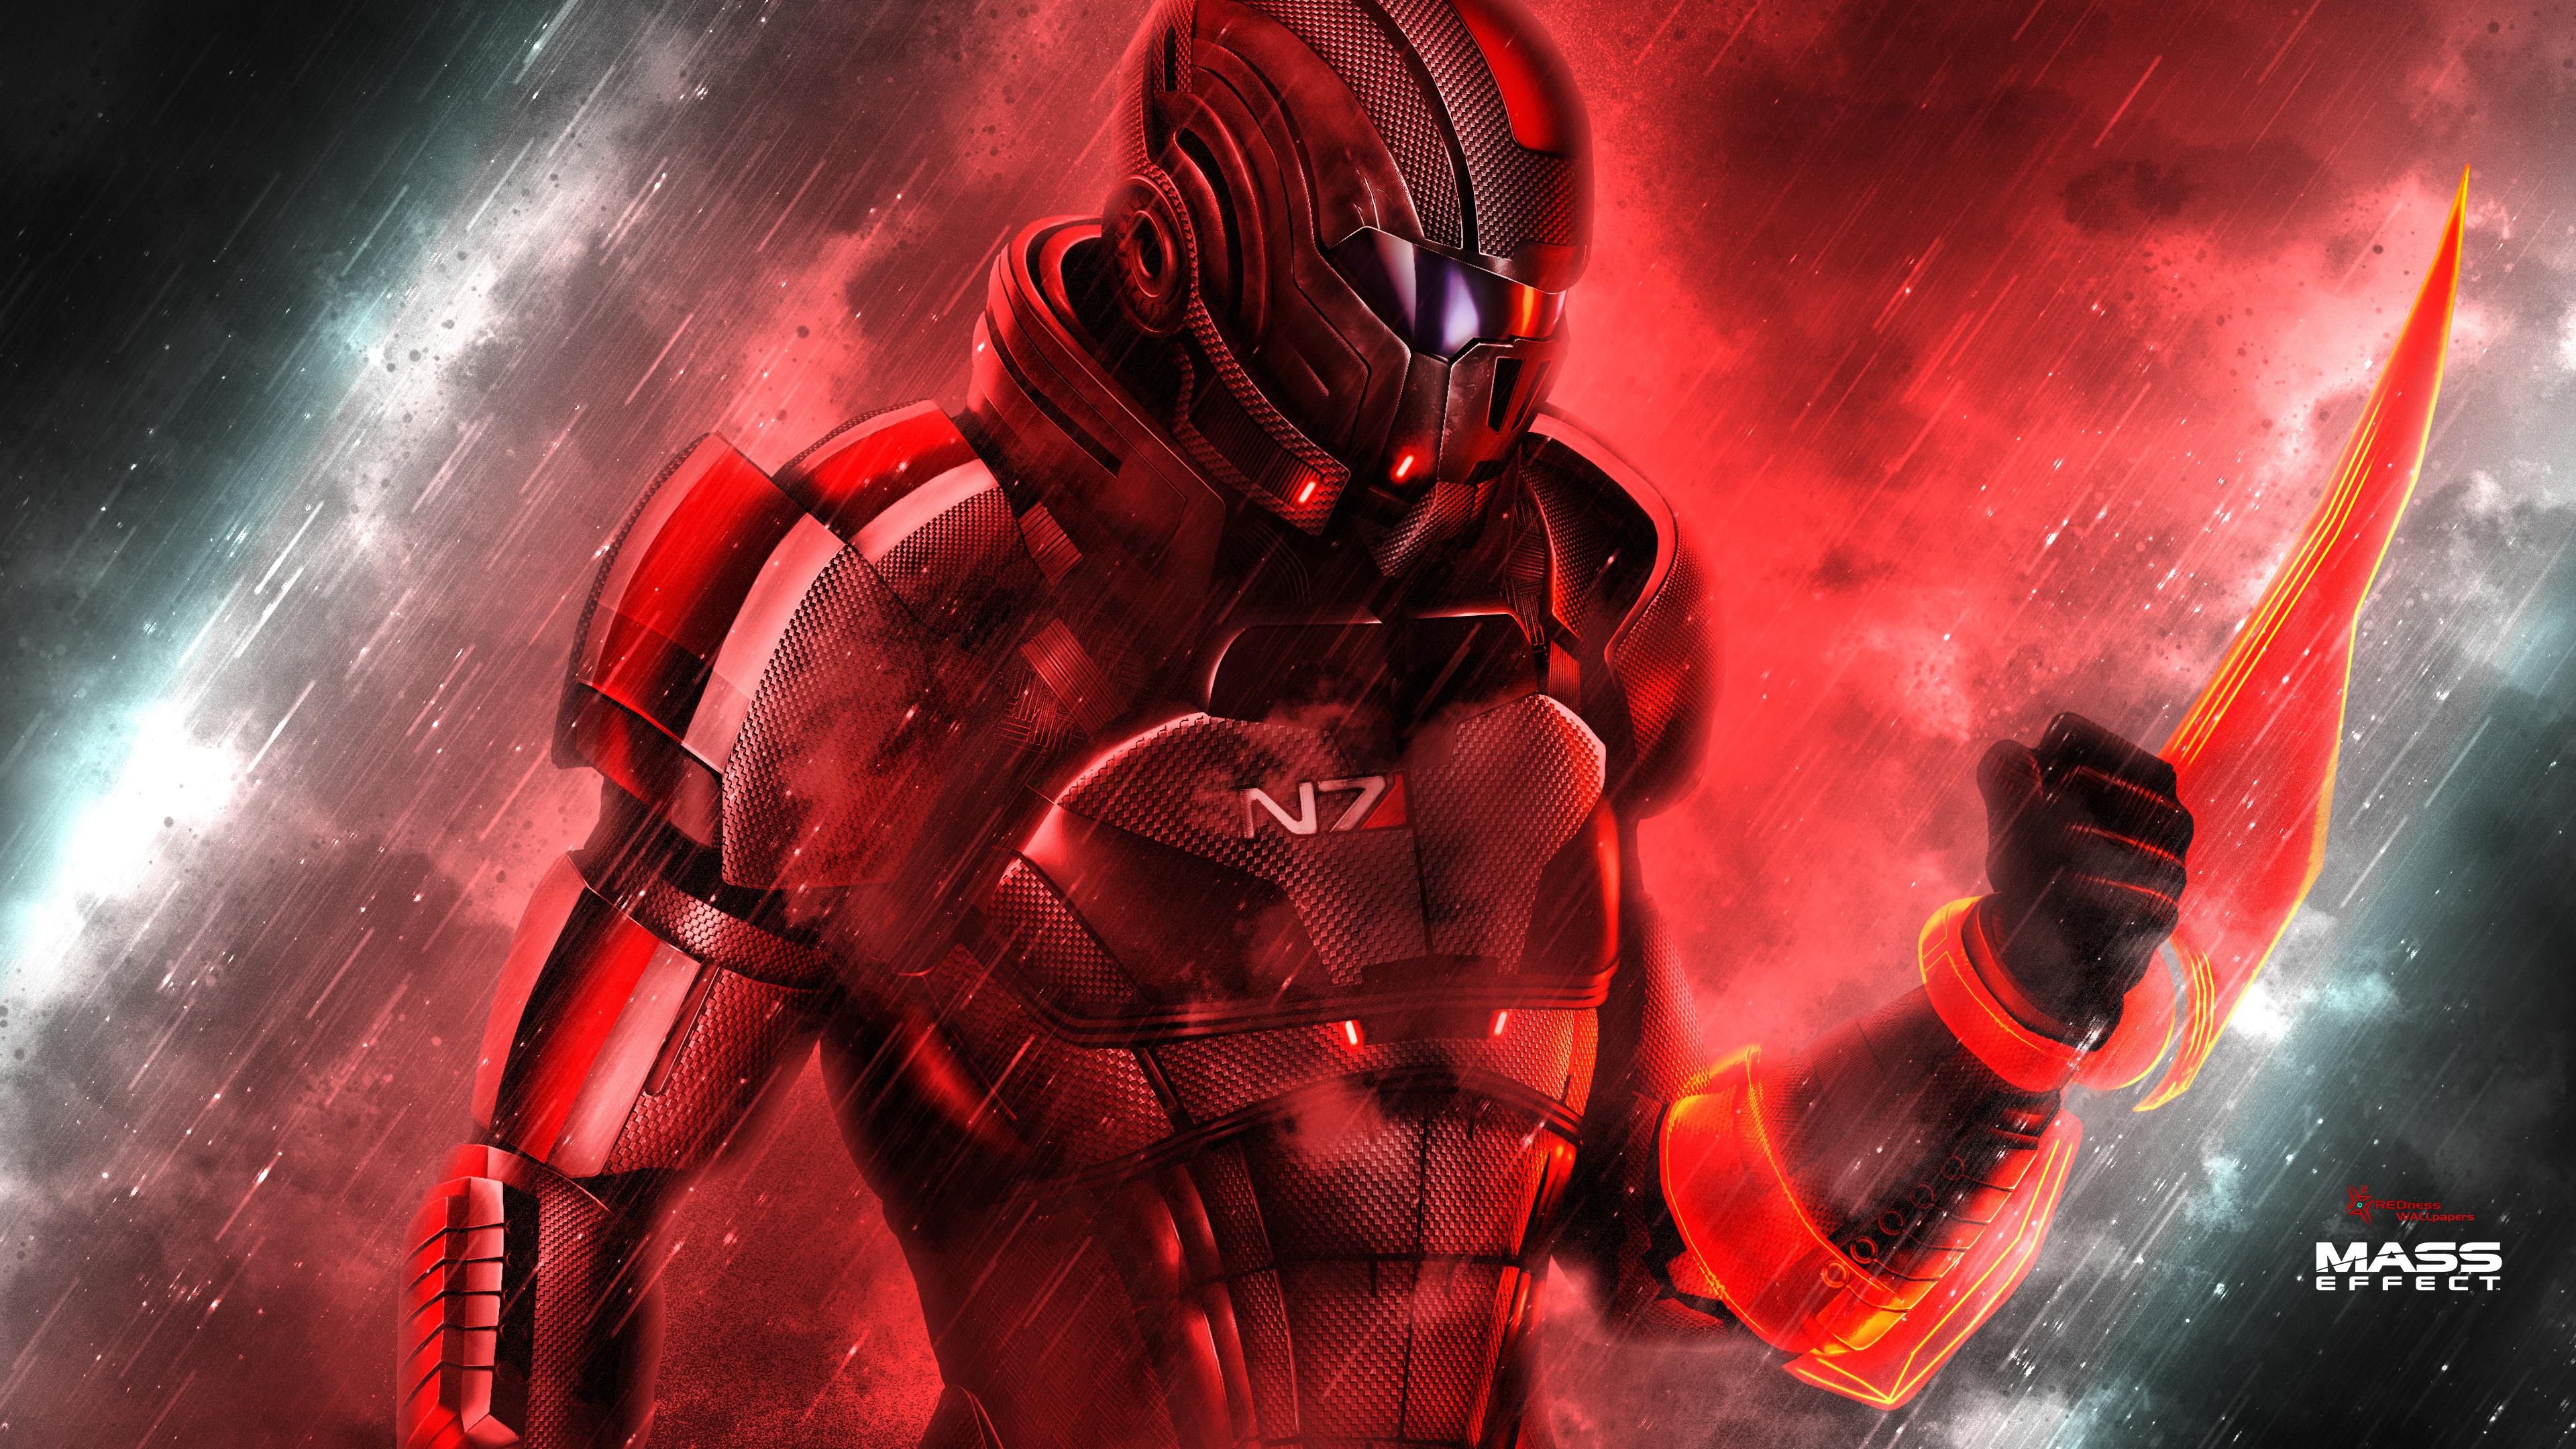 Femshep Mass Effect 4k, HD Games, 4k Wallpapers, Images ...